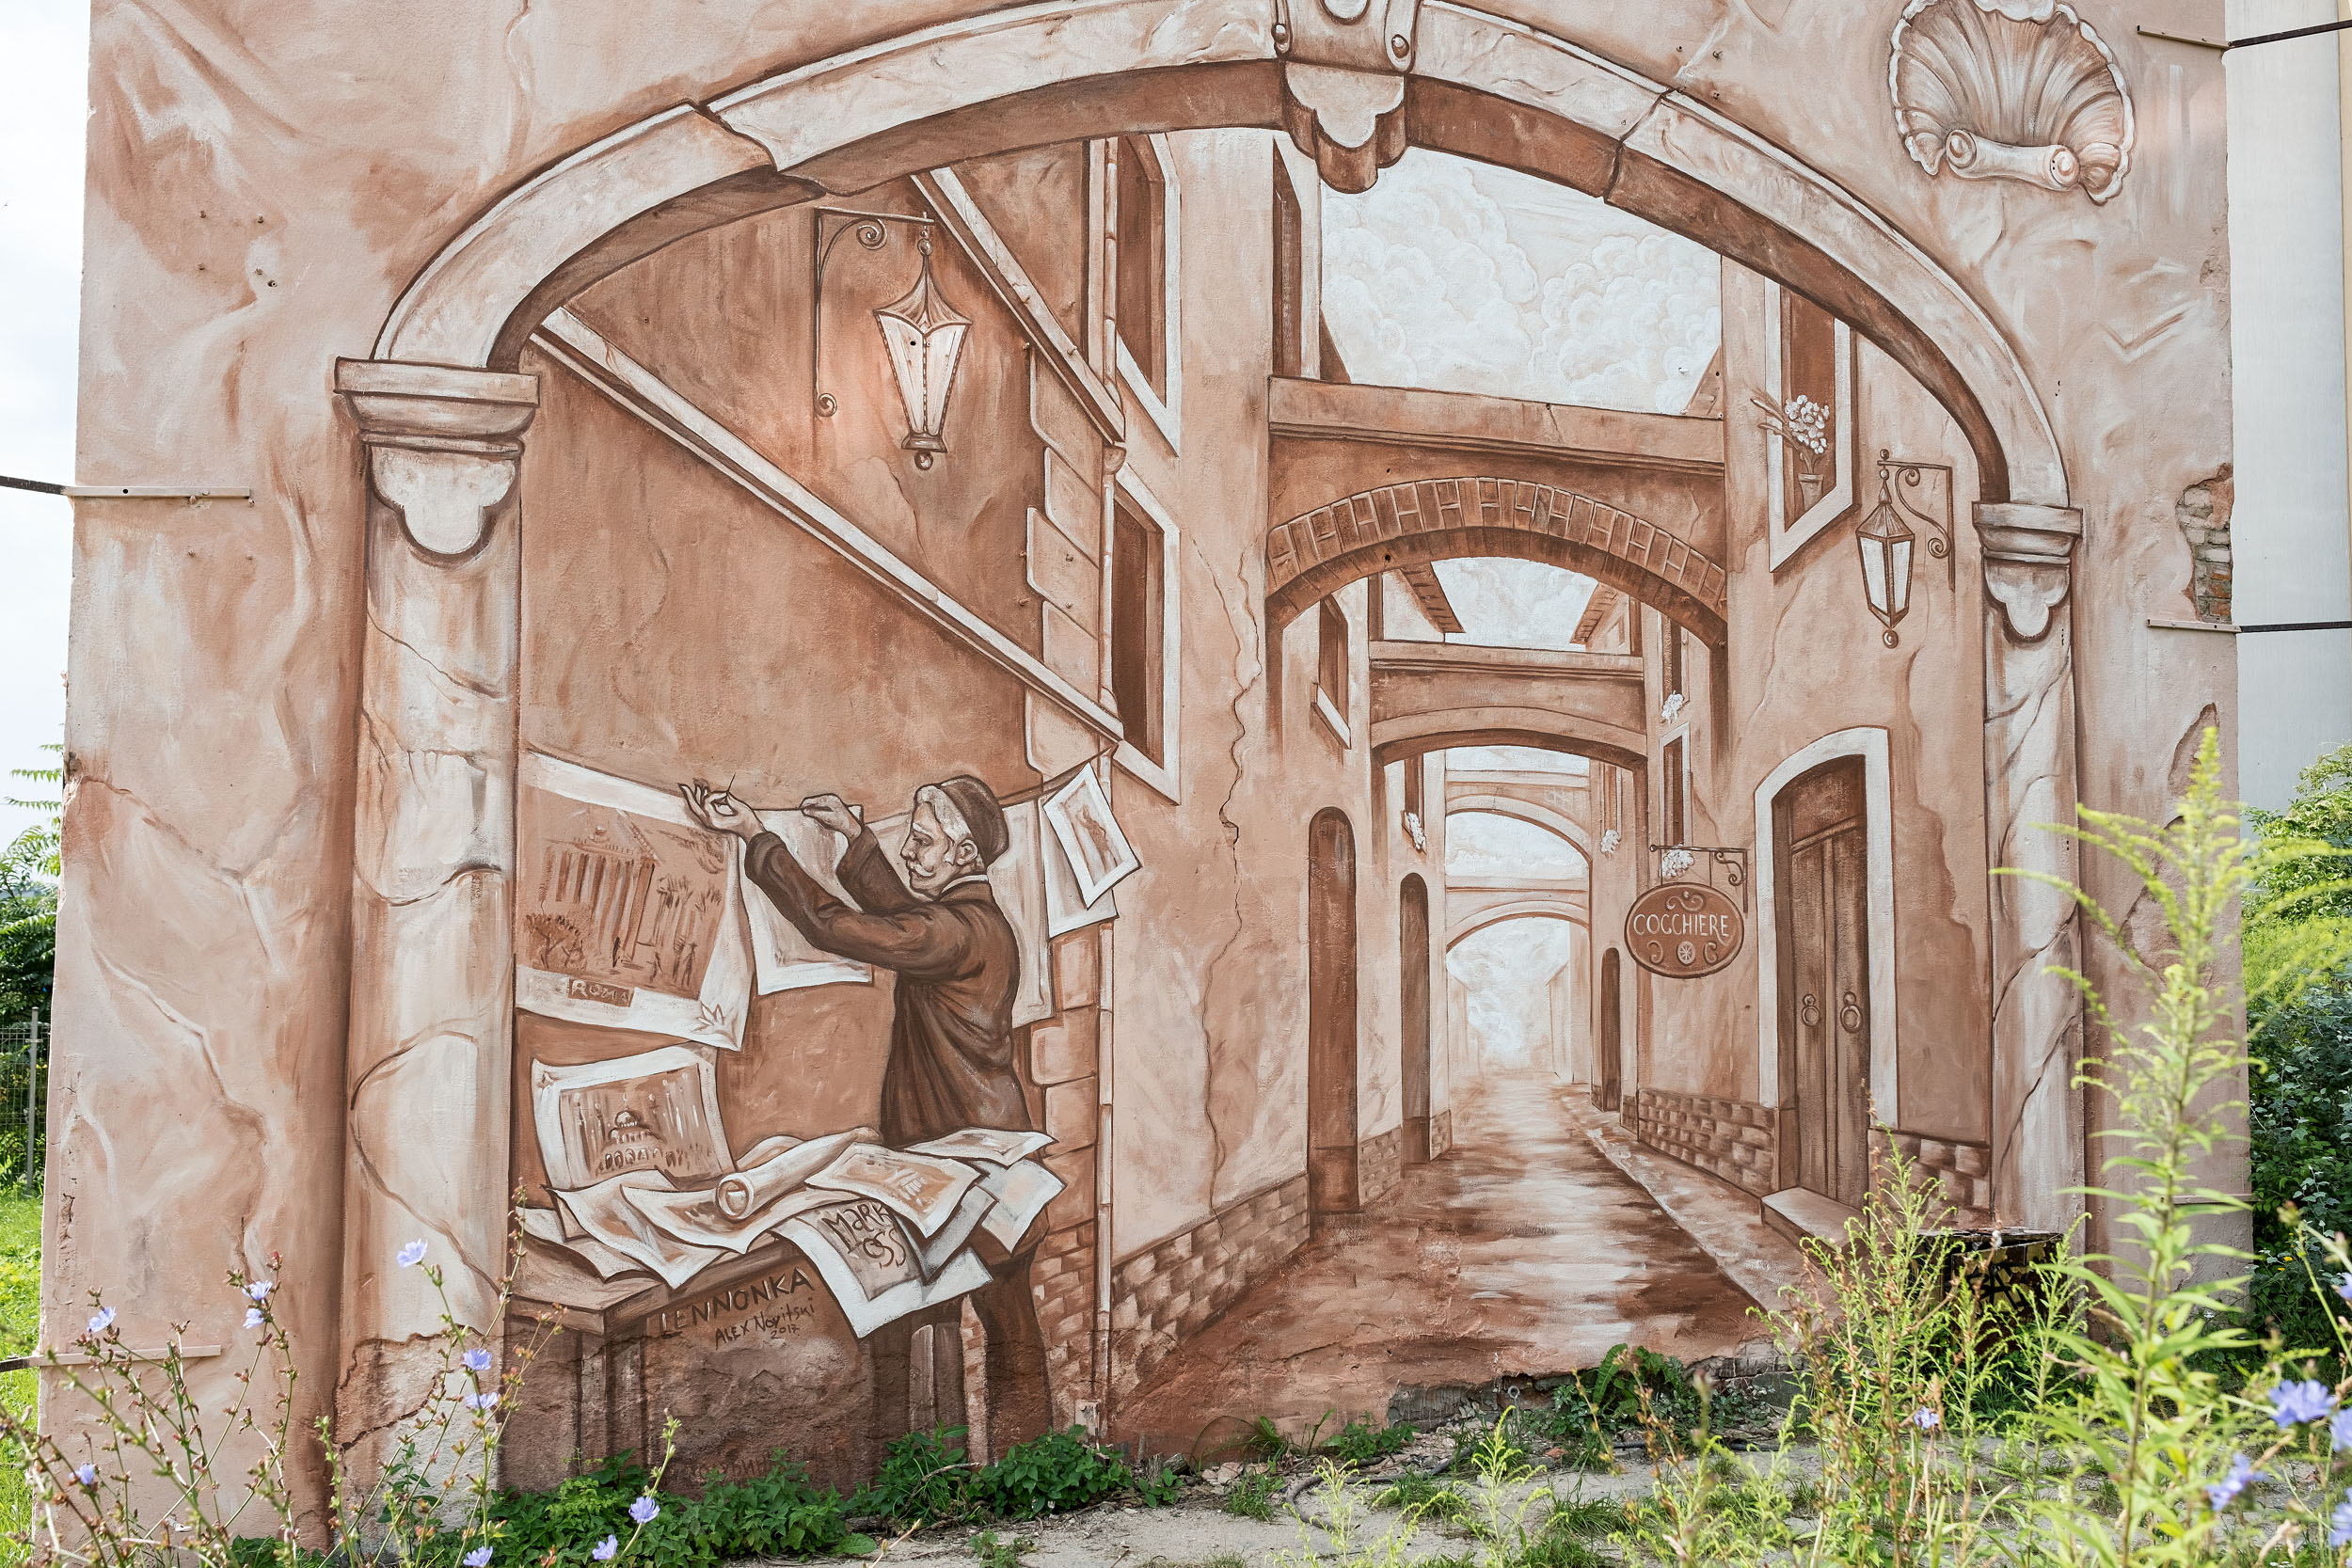 """Neighbors"" by Mark Maksimovich and Alex Novitski in Poznan, Poland Artes & contextos 010"